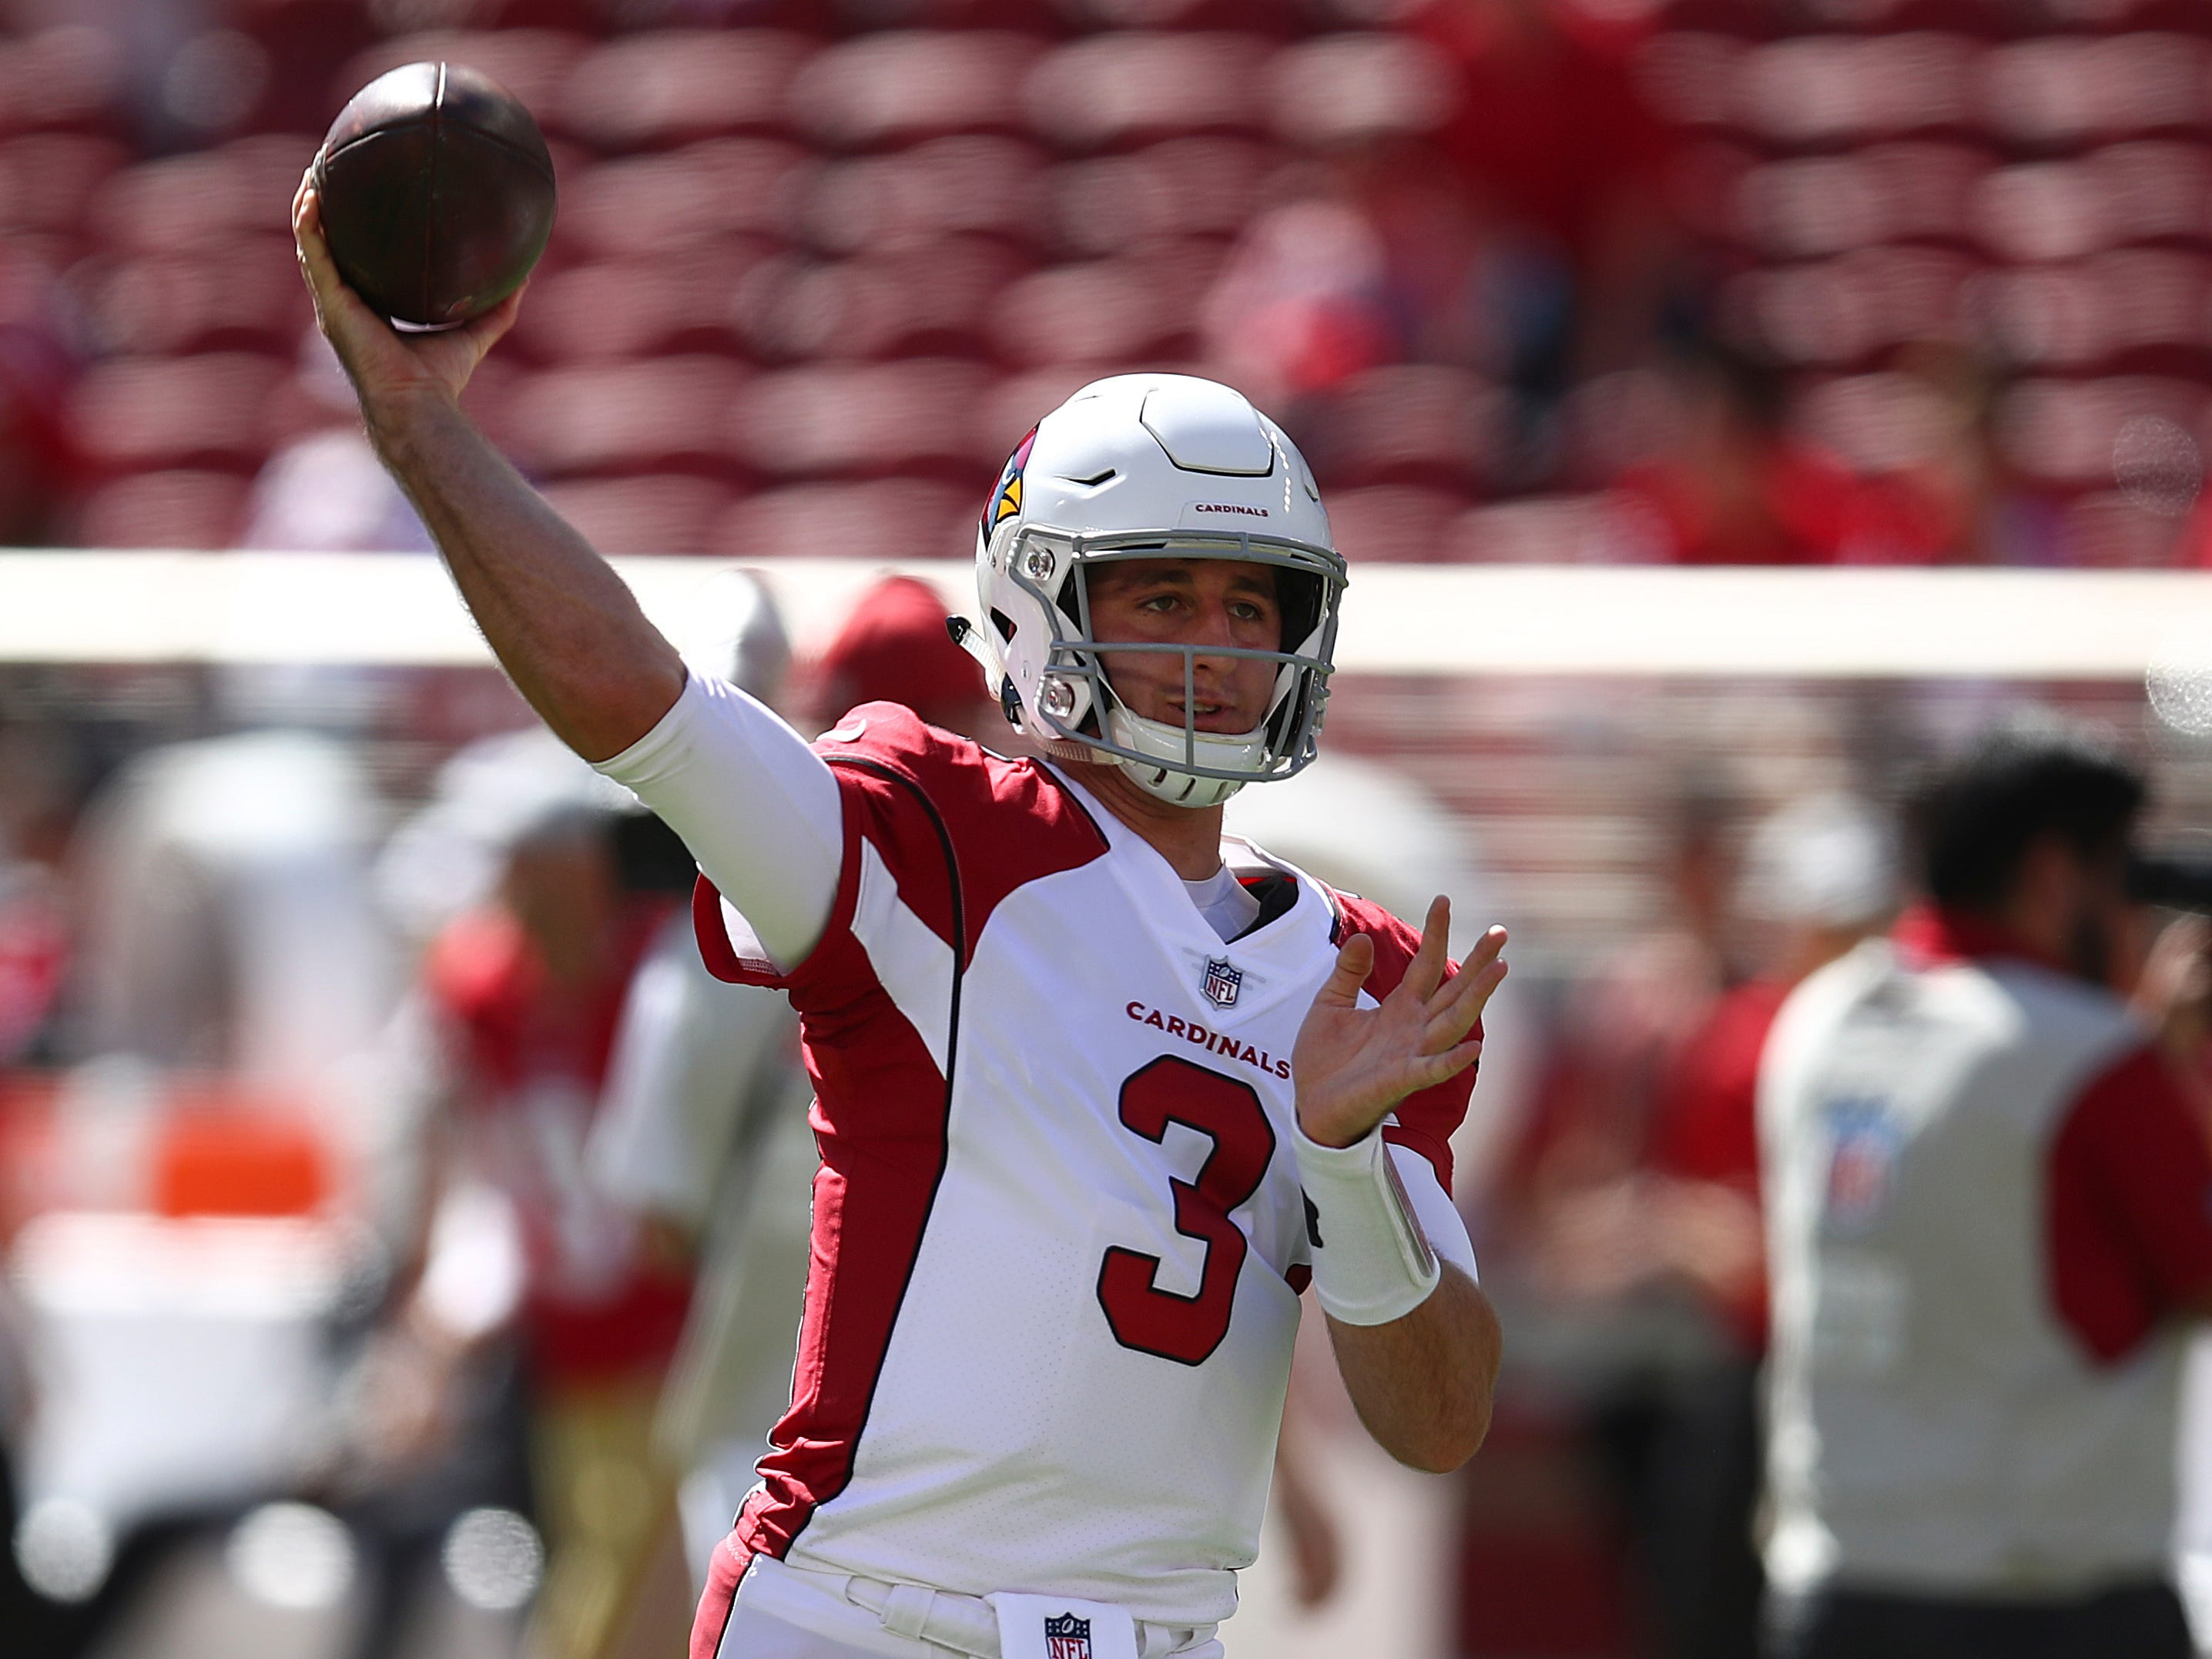 Arizona Cardinals quarterback Josh Rosen (3) warms up before an NFL football game against the San Francisco 49ers in Santa Clara, Calif., Sunday, Oct. 7, 2018.